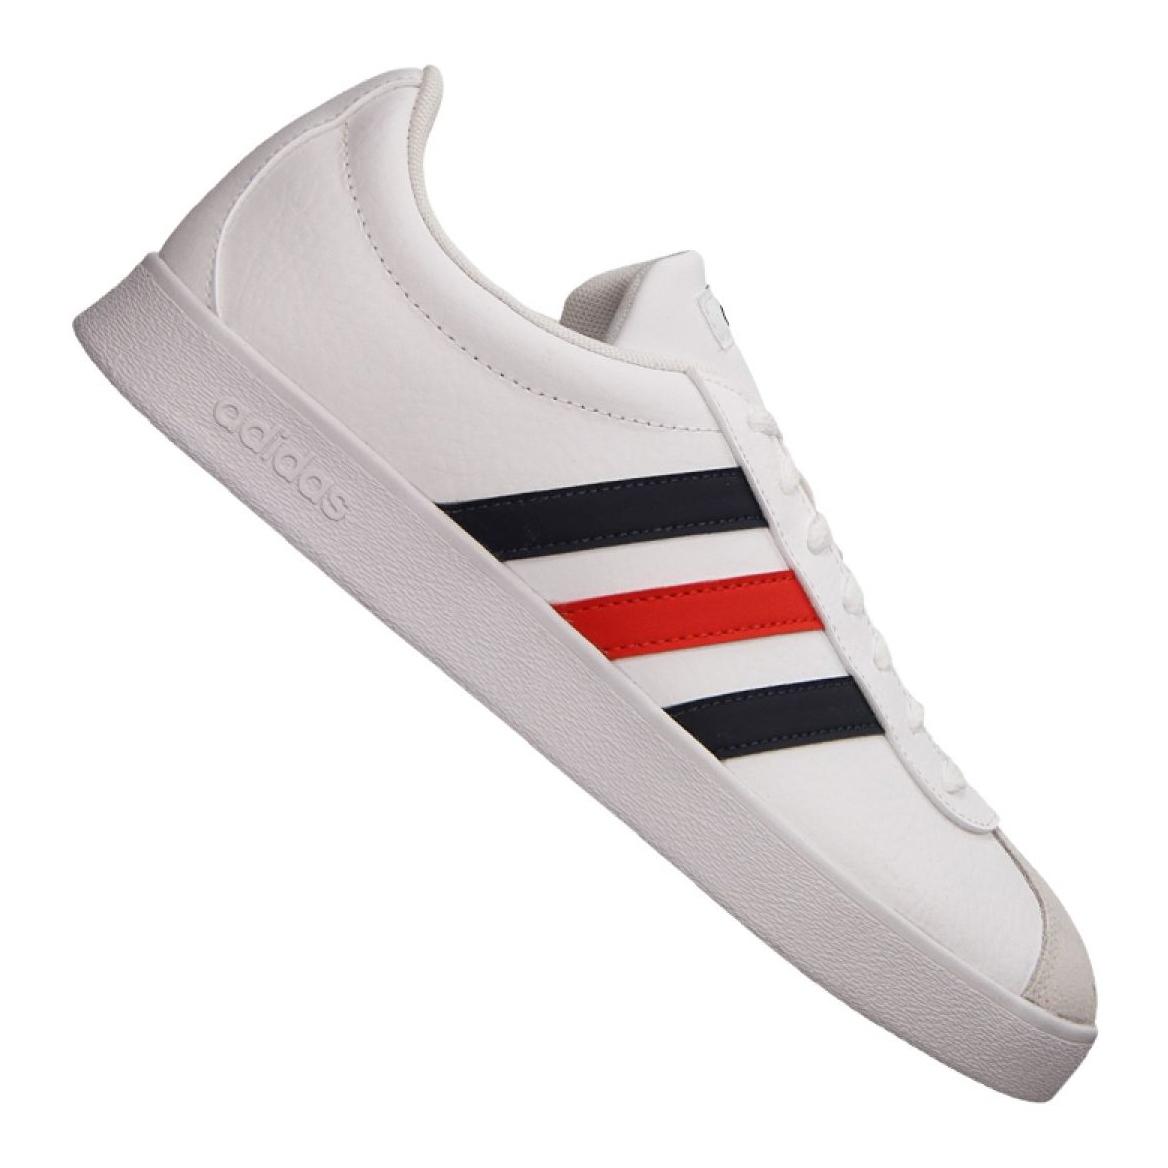 adidas vl court 2 shoes mens